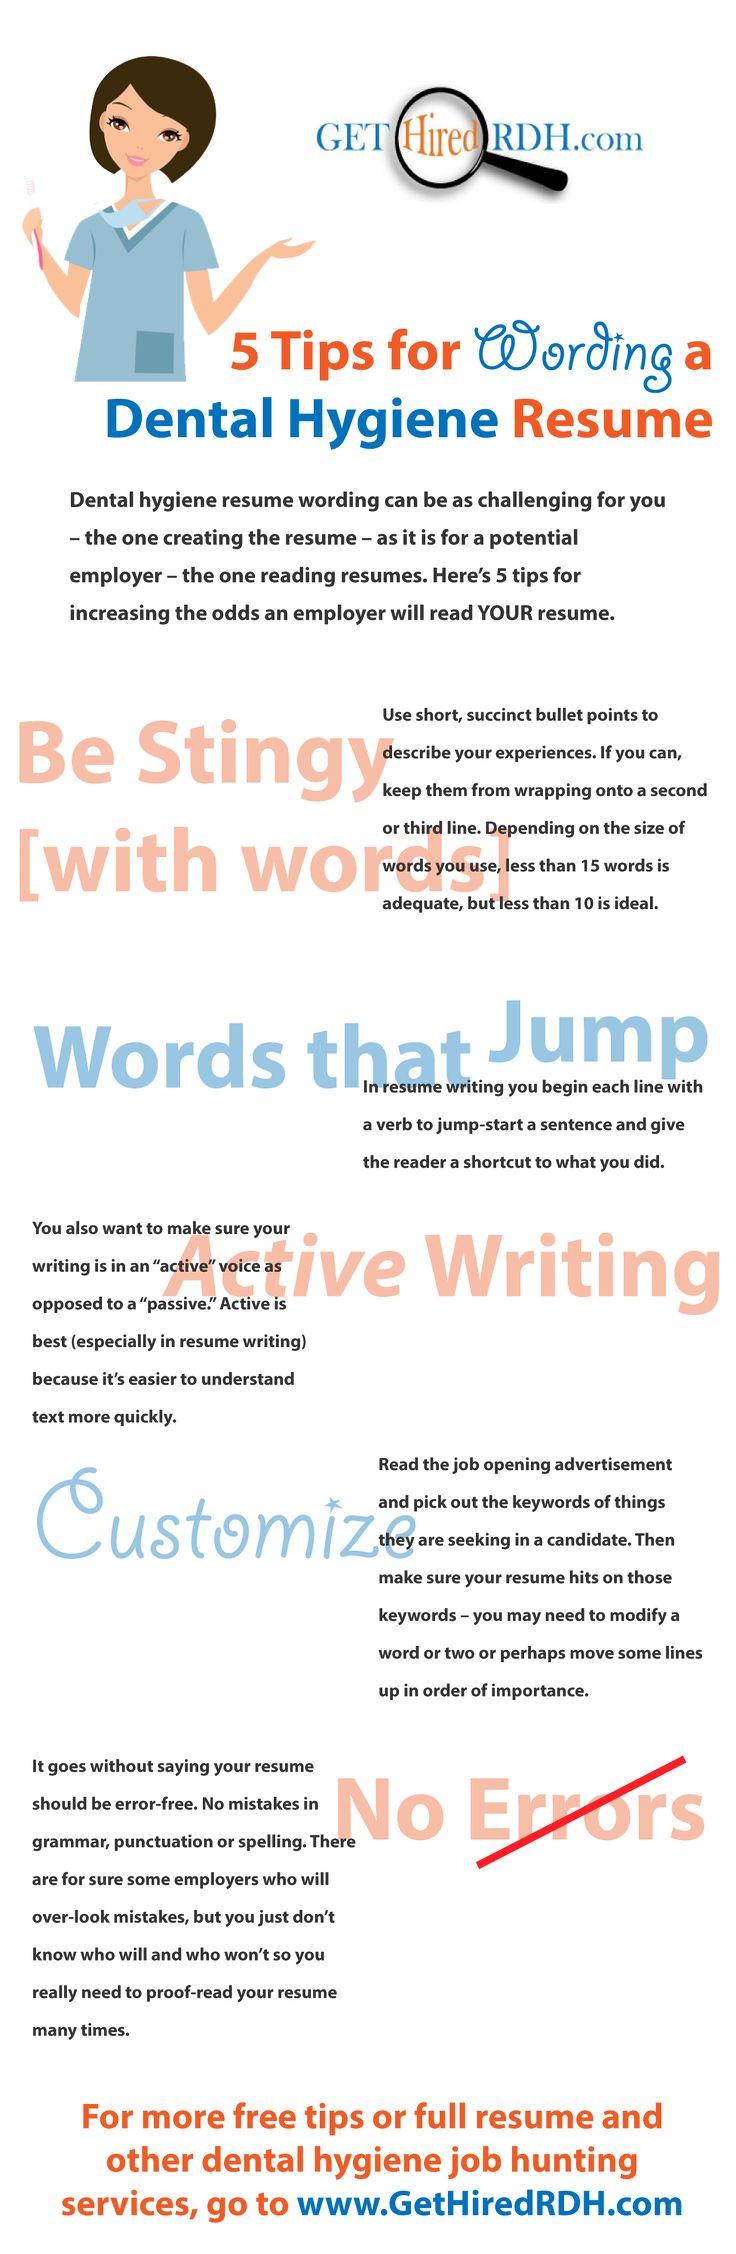 5-Tips-for-Wording-a-Dental-Hygiene-Resume